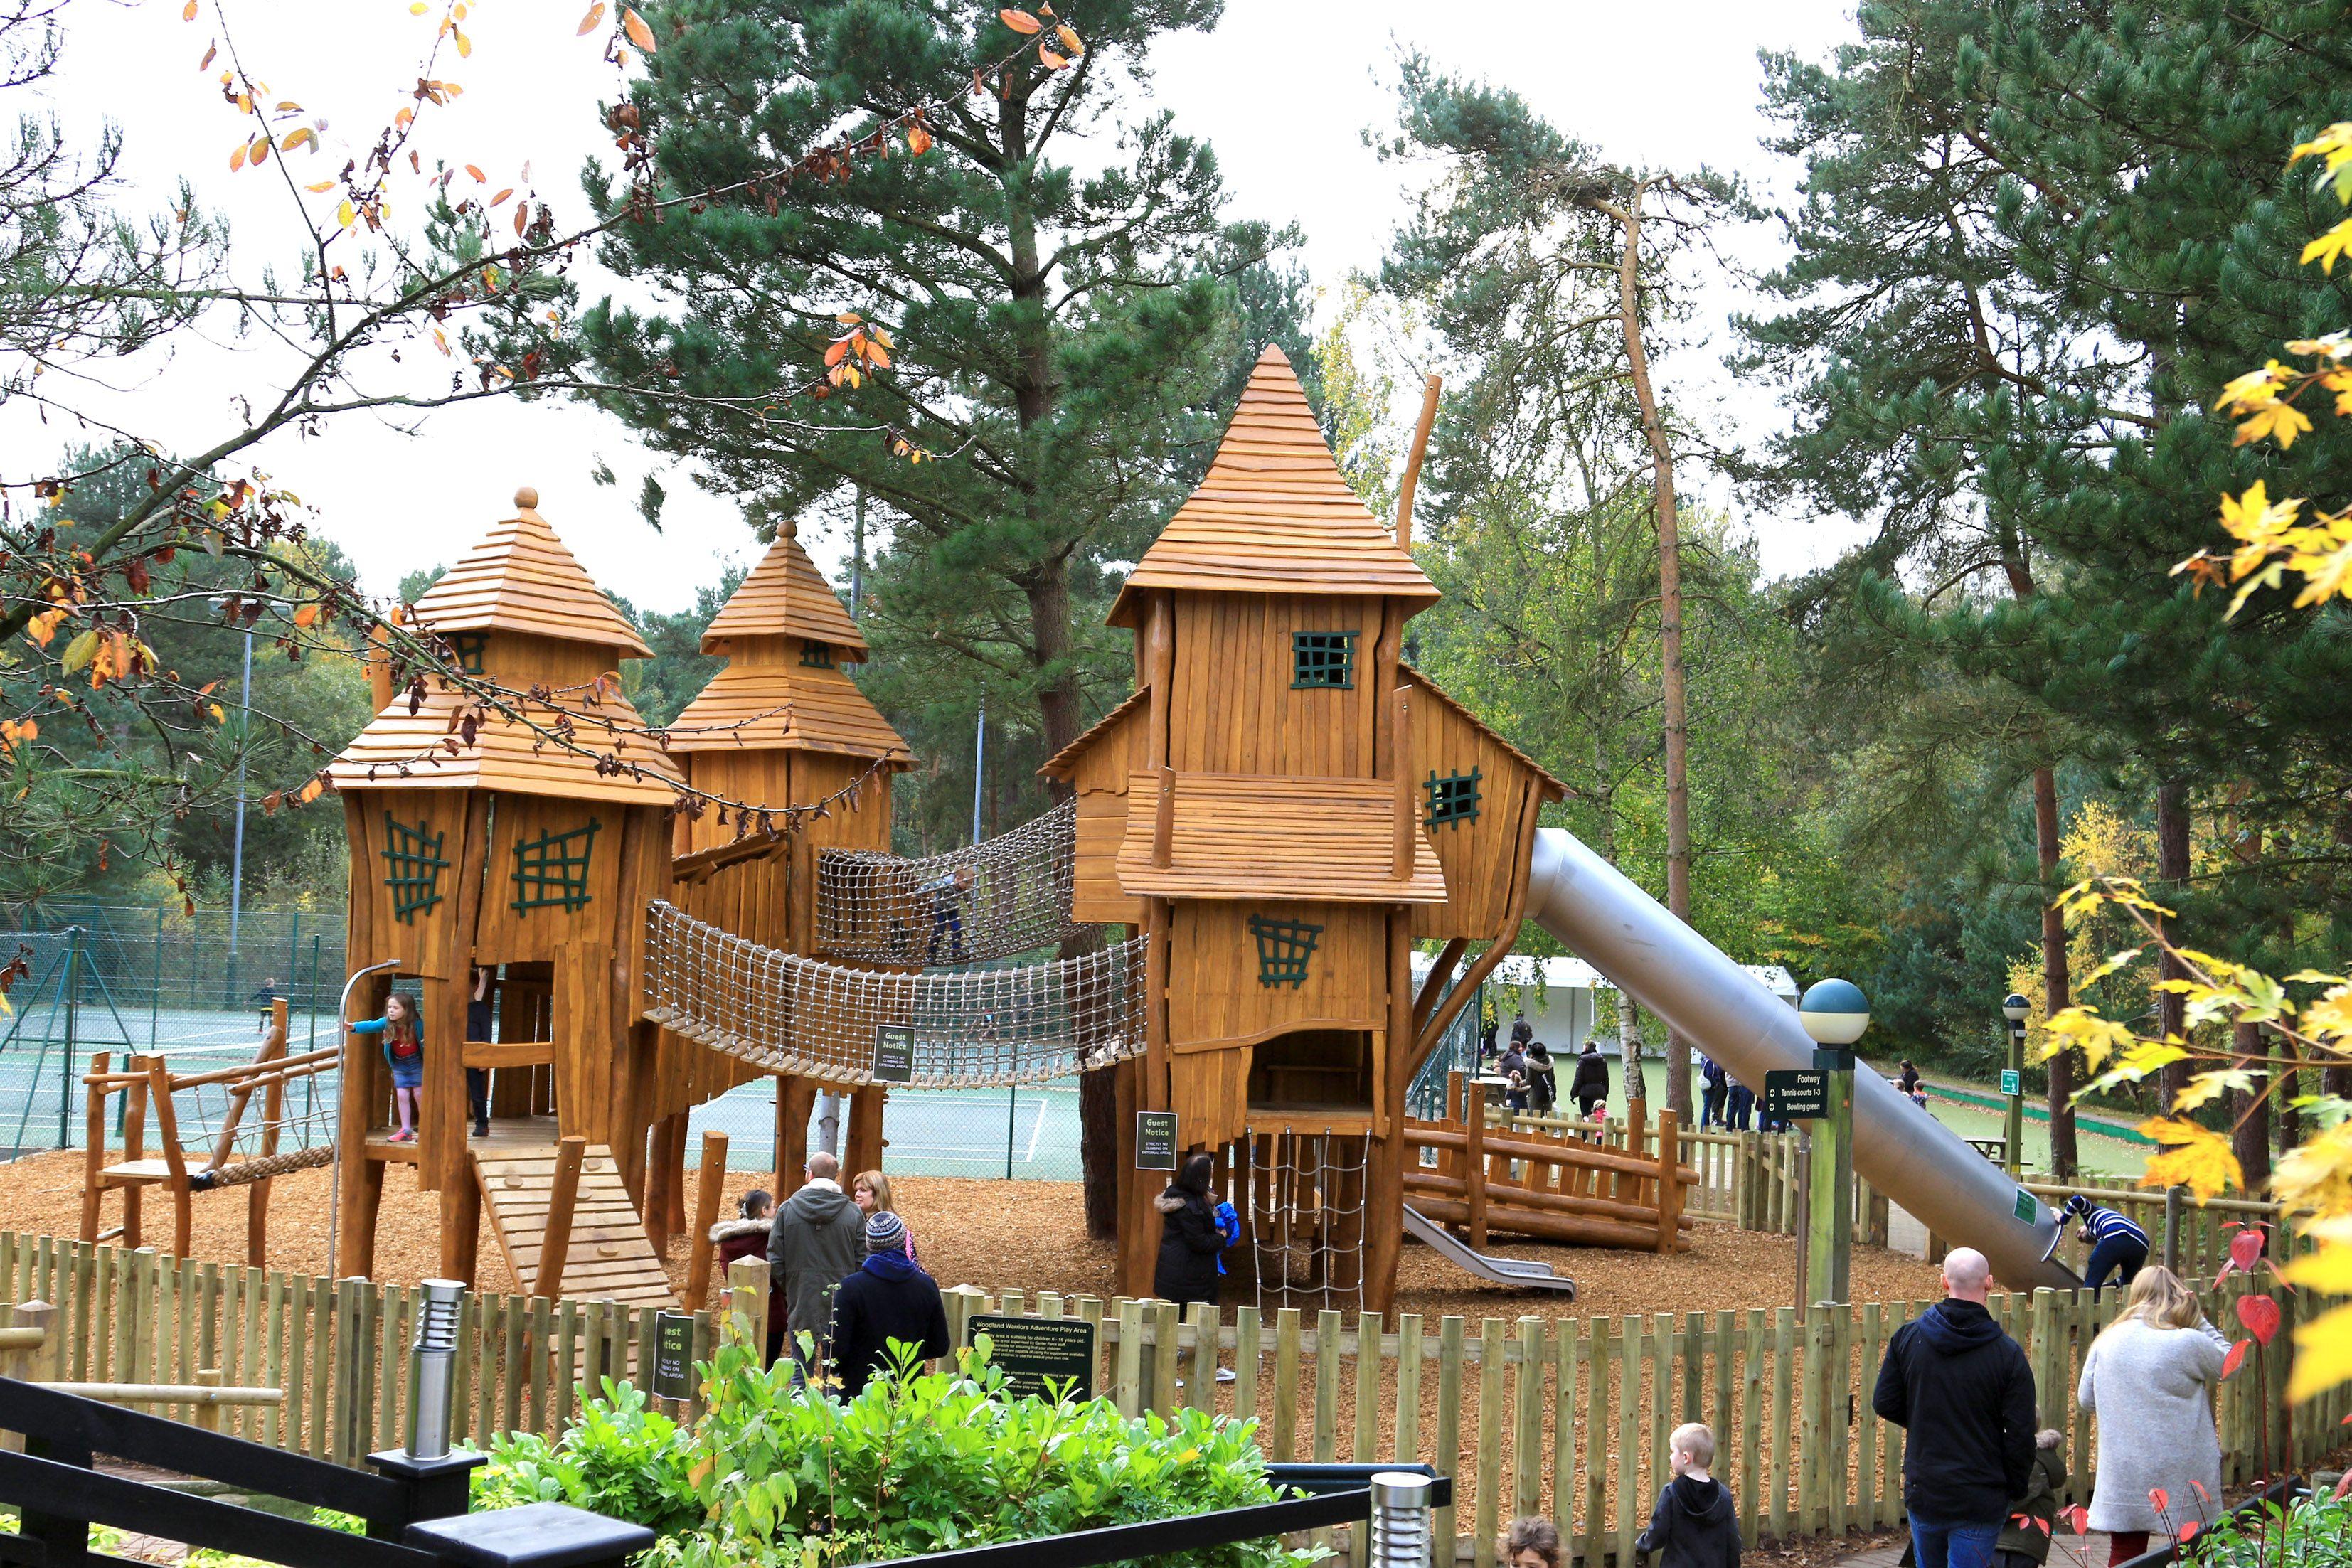 Center Parcs Playground Design Installation Russell Play Playground Design Outdoor Play Structures Playground Swing Set